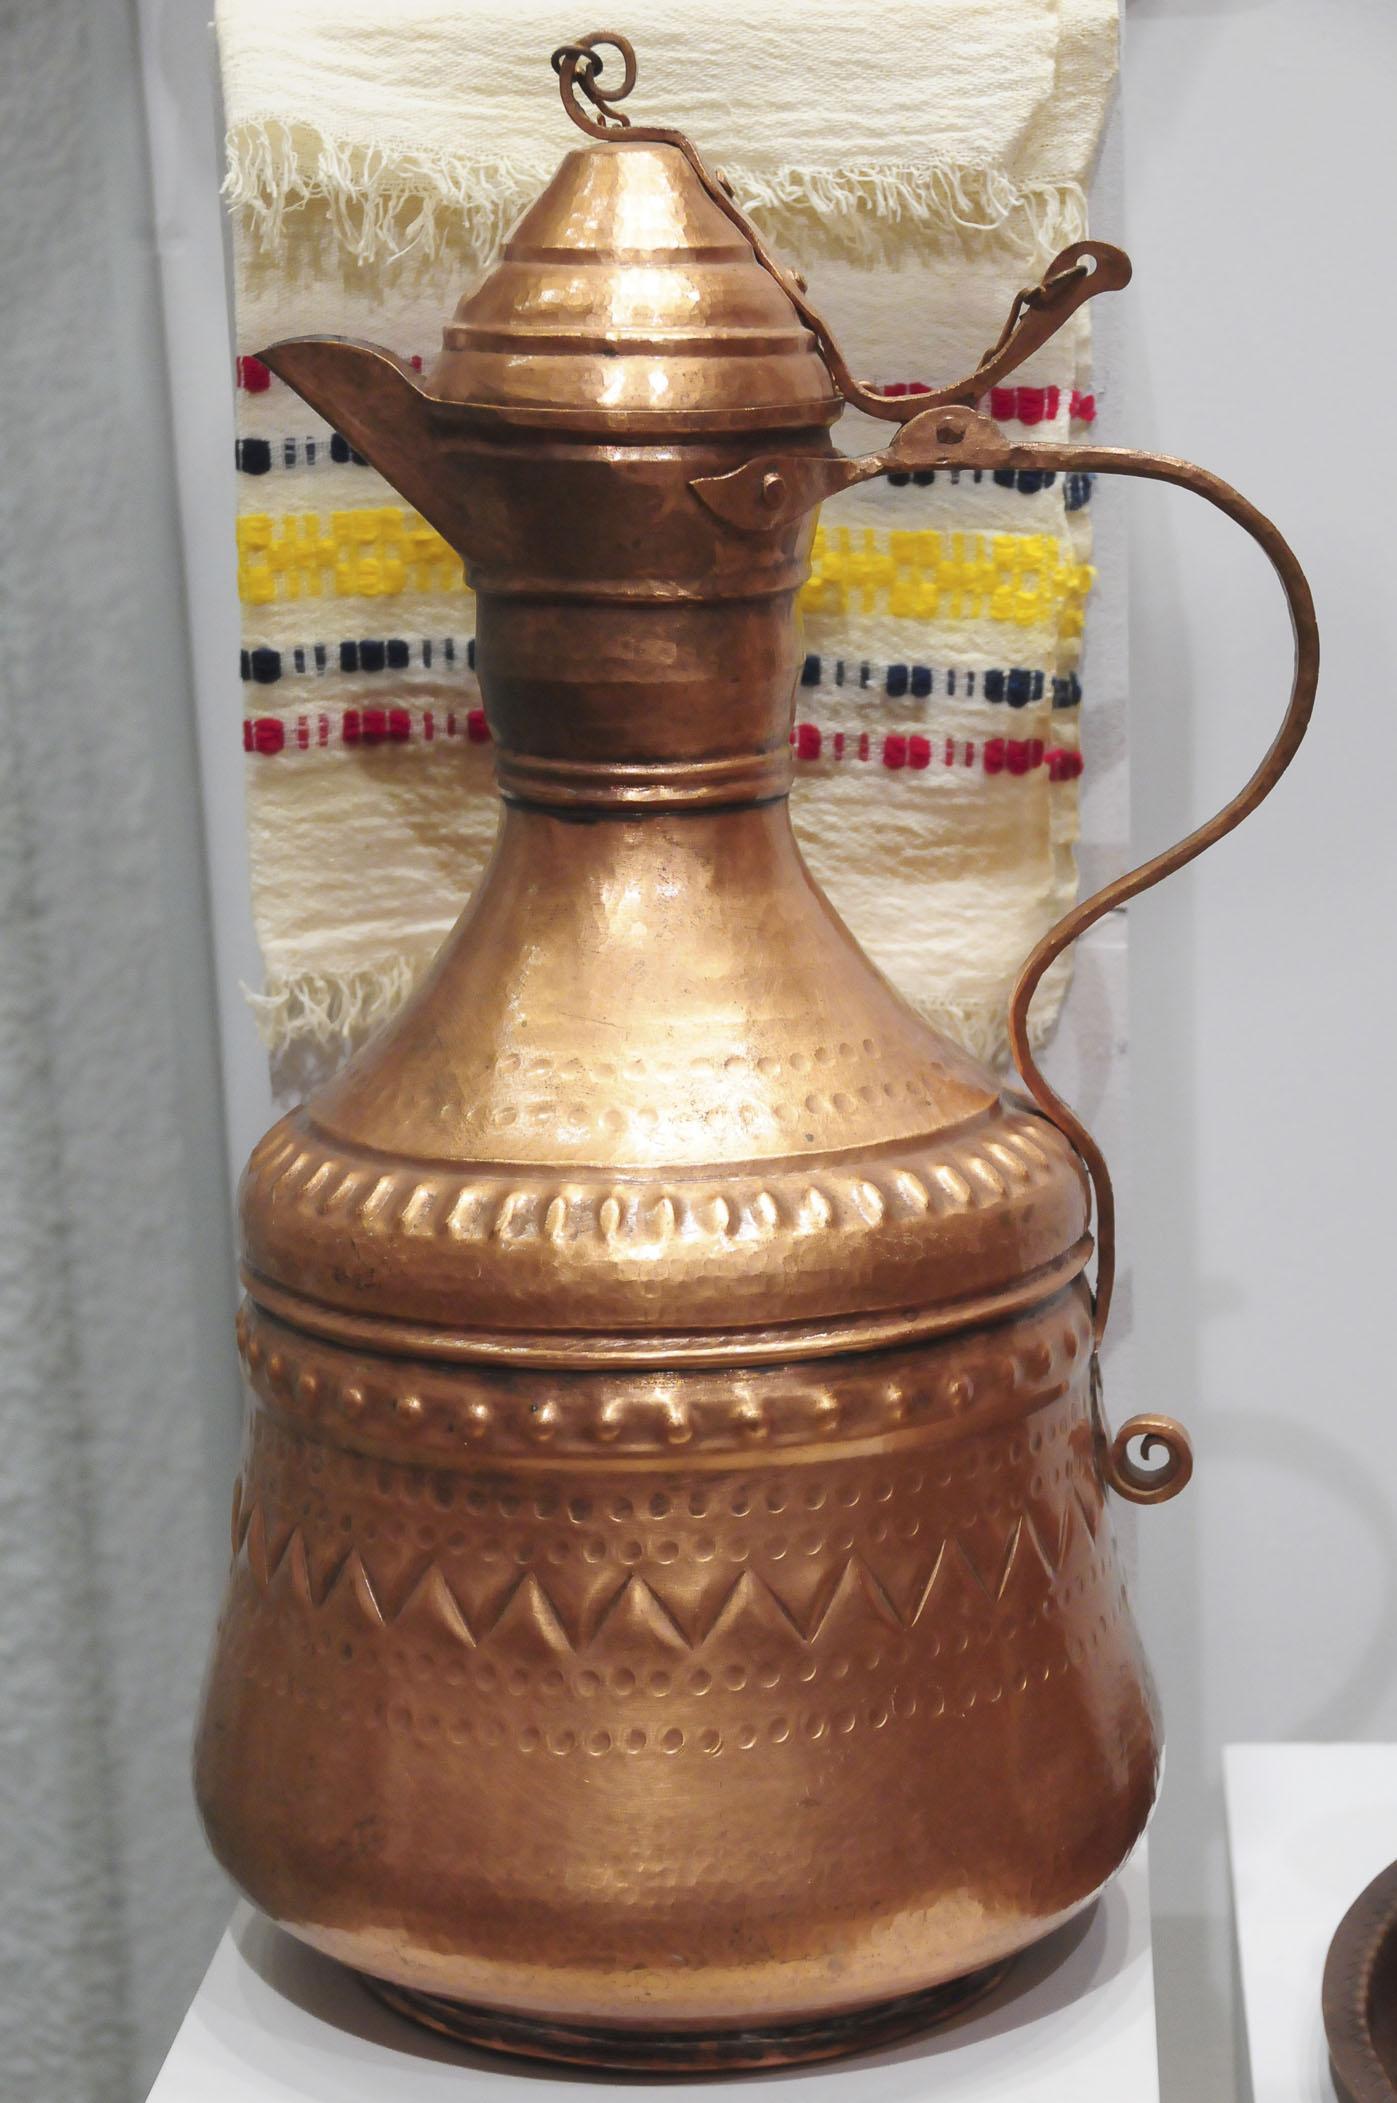 troyan-museum-mednikarstvo-ot-troyanskiq-krai-24